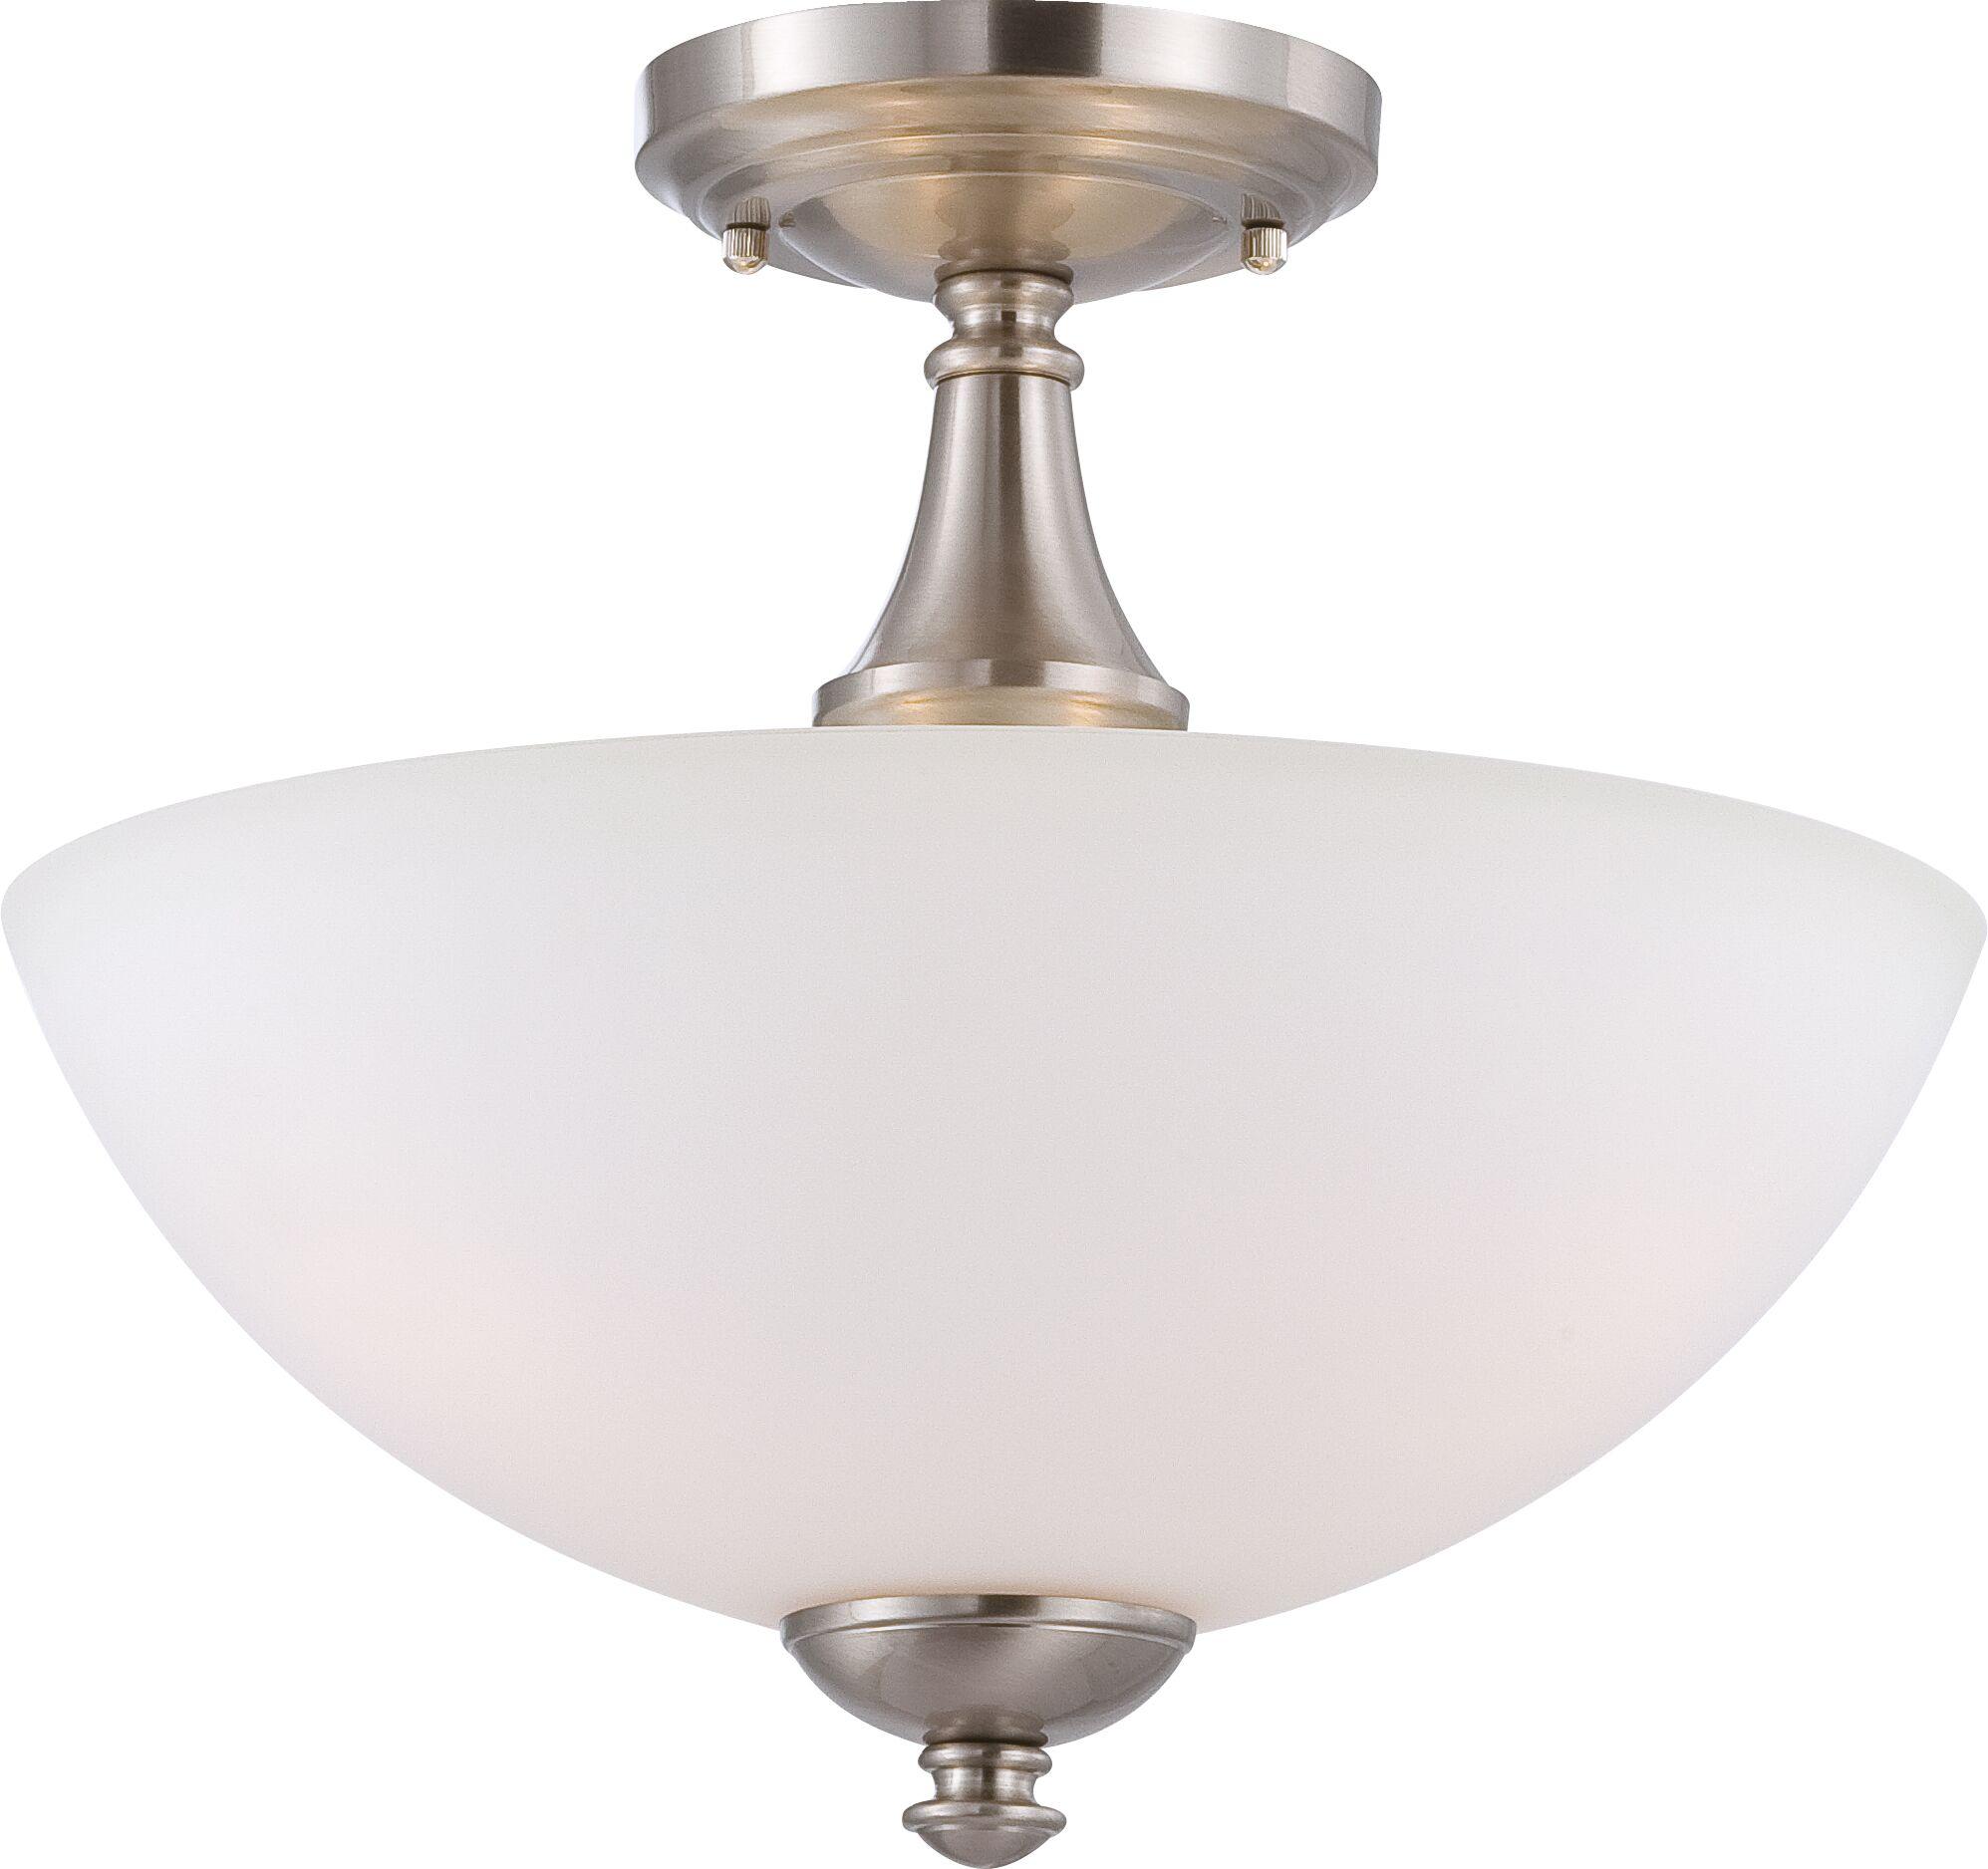 Rockford 3-Light Semi Flush Mount Color: Brushed Nickel, Bulb Type: T2 Mini Spiral